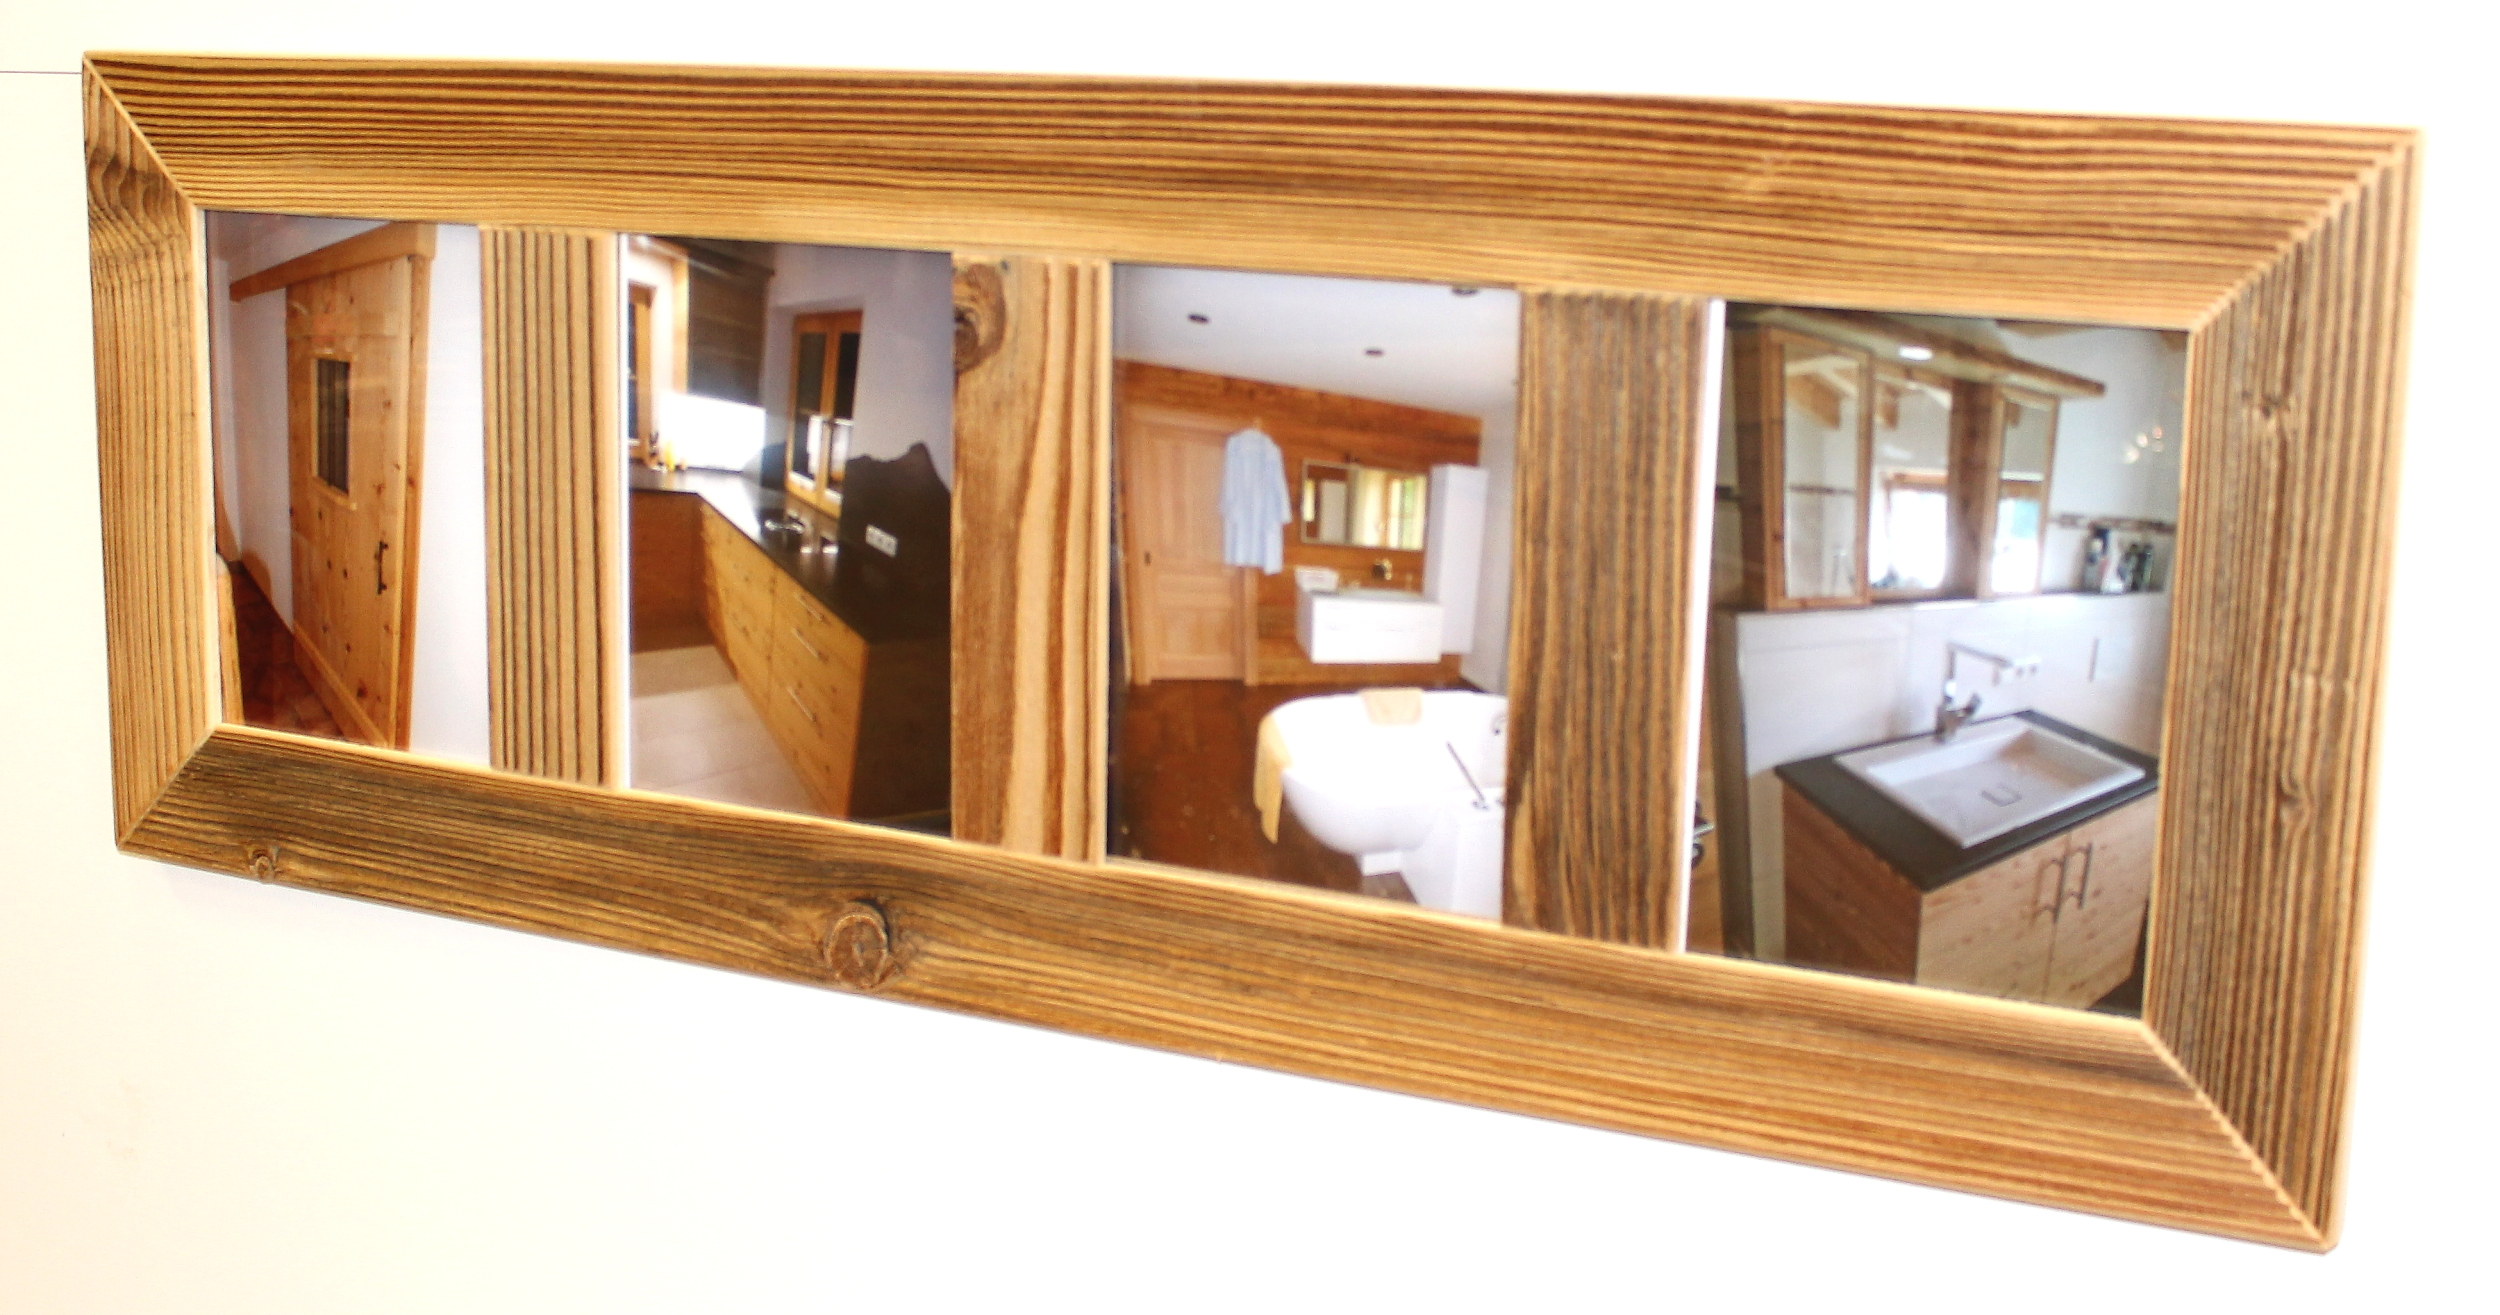 altholz bilderrahmen 4er bilderrahmen holz startseite individuelle holz bilderrahmen von. Black Bedroom Furniture Sets. Home Design Ideas